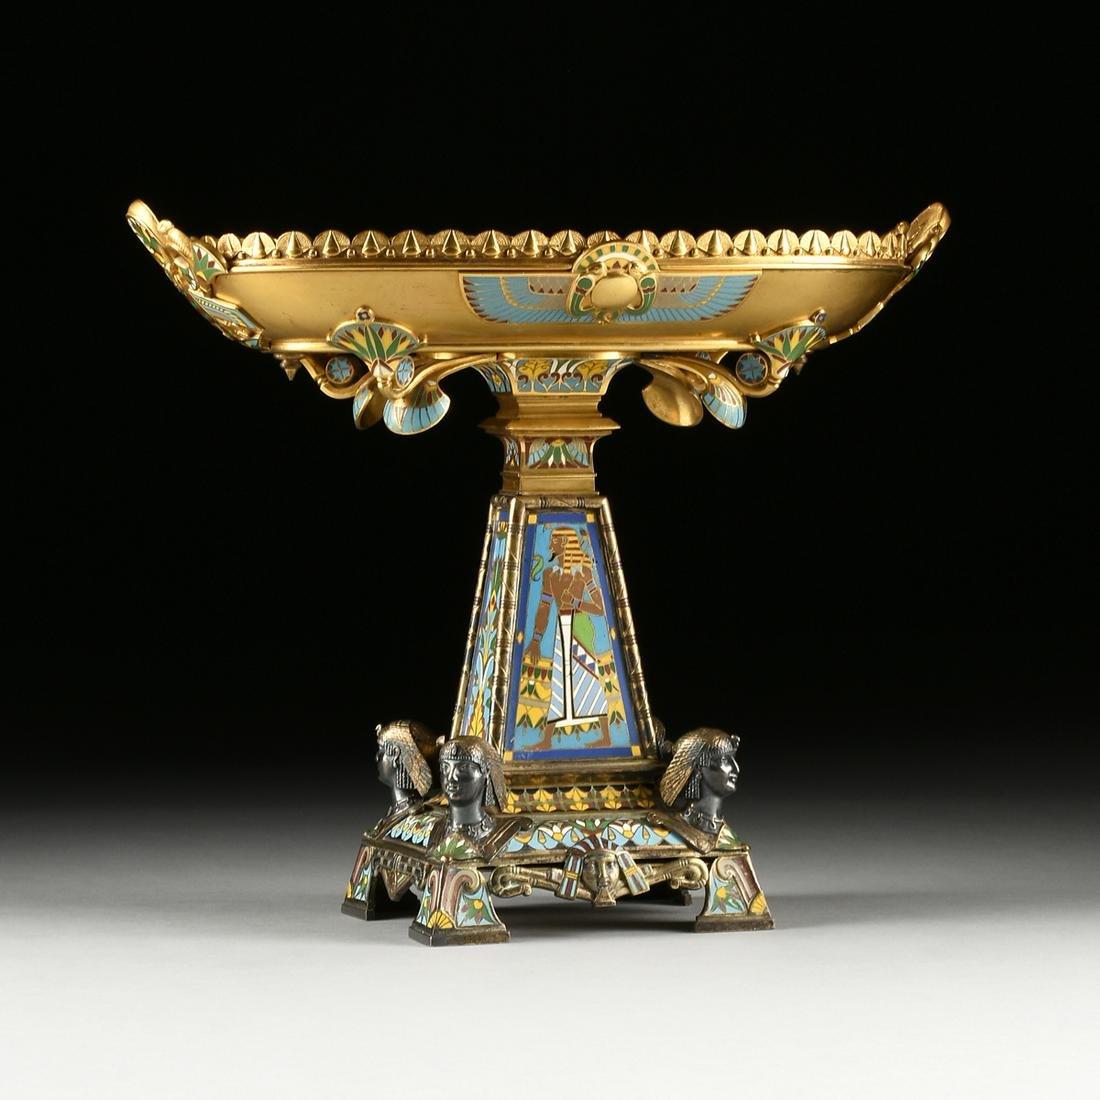 A PHILADELPHIA EXHIBITION EGYPTIAN REVIVAL GILT